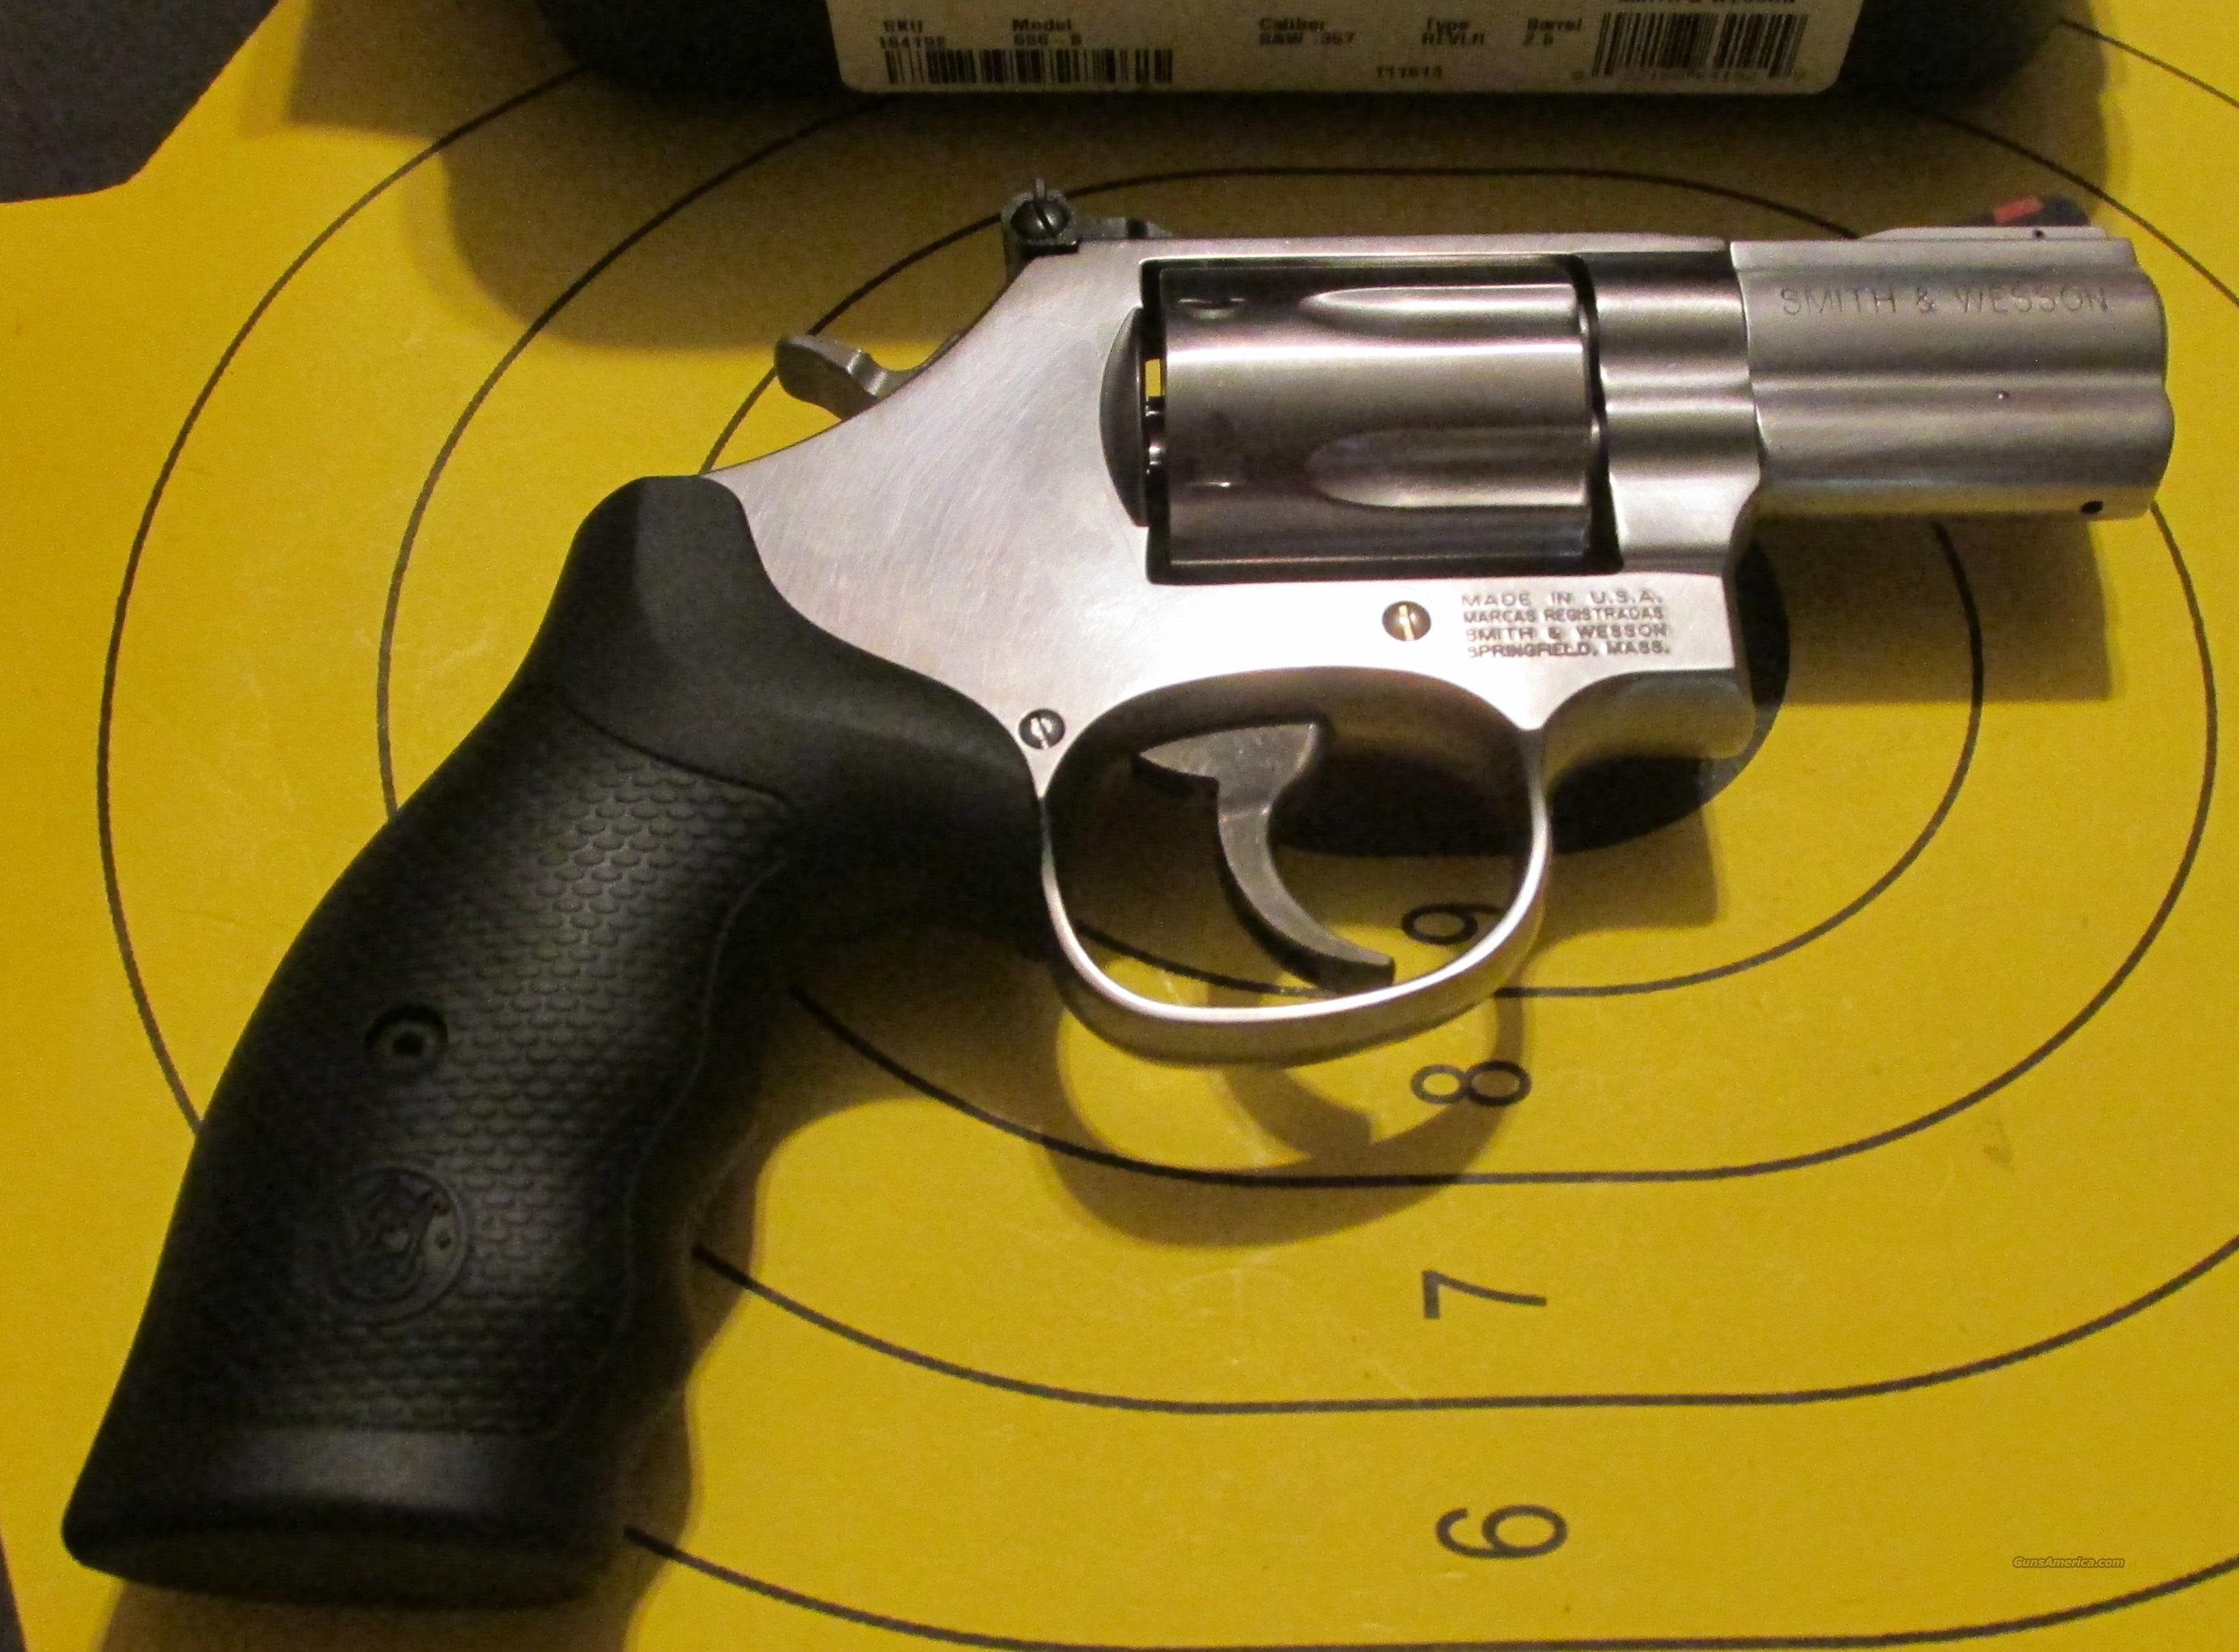 Smith & Wesson 686-6 357 Revolver  Guns > Pistols > Smith & Wesson Revolvers > Full Frame Revolver